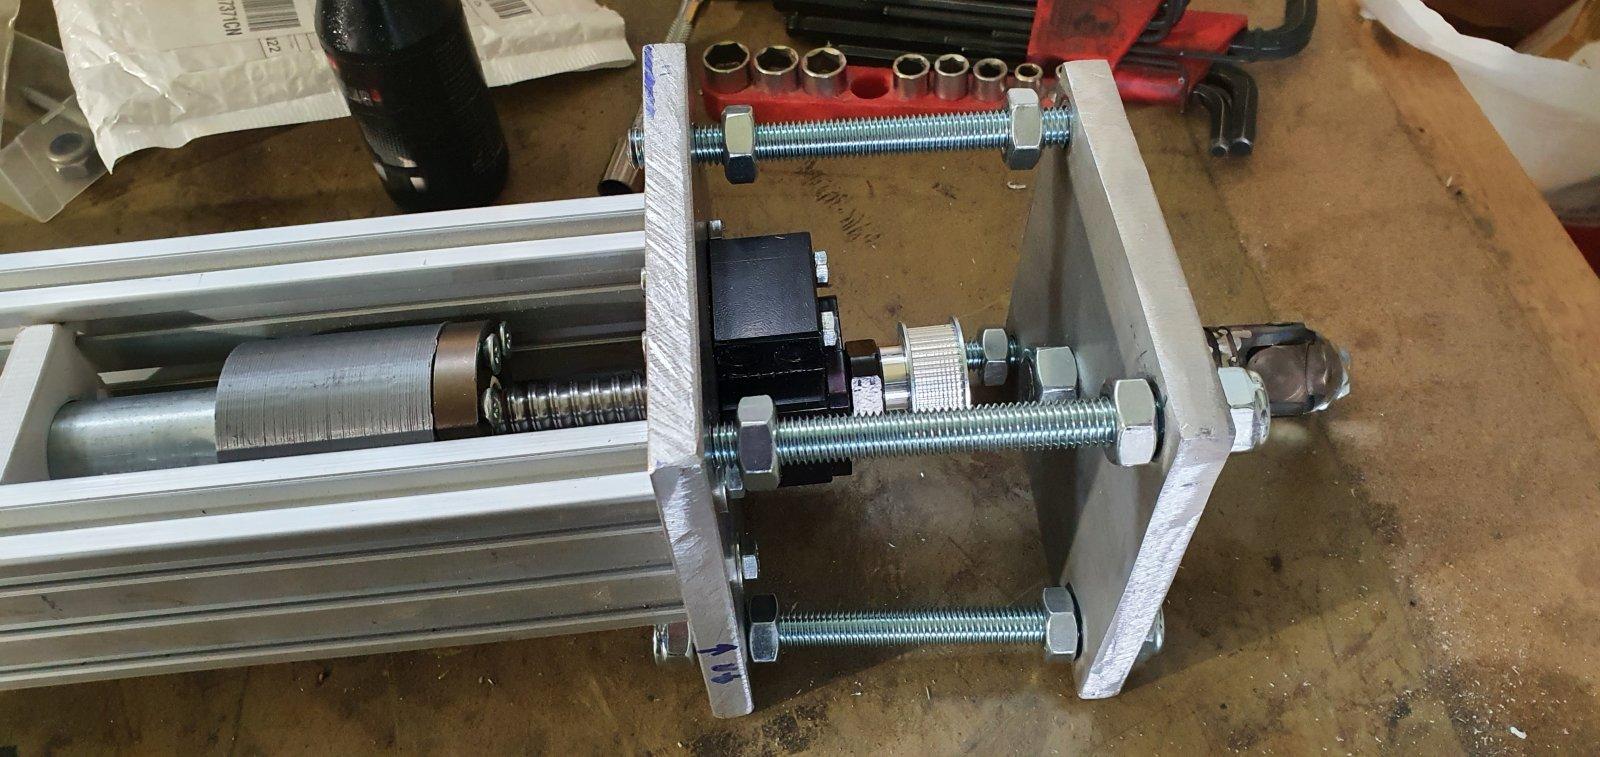 Actuator 2 bottom end in progress.jpg